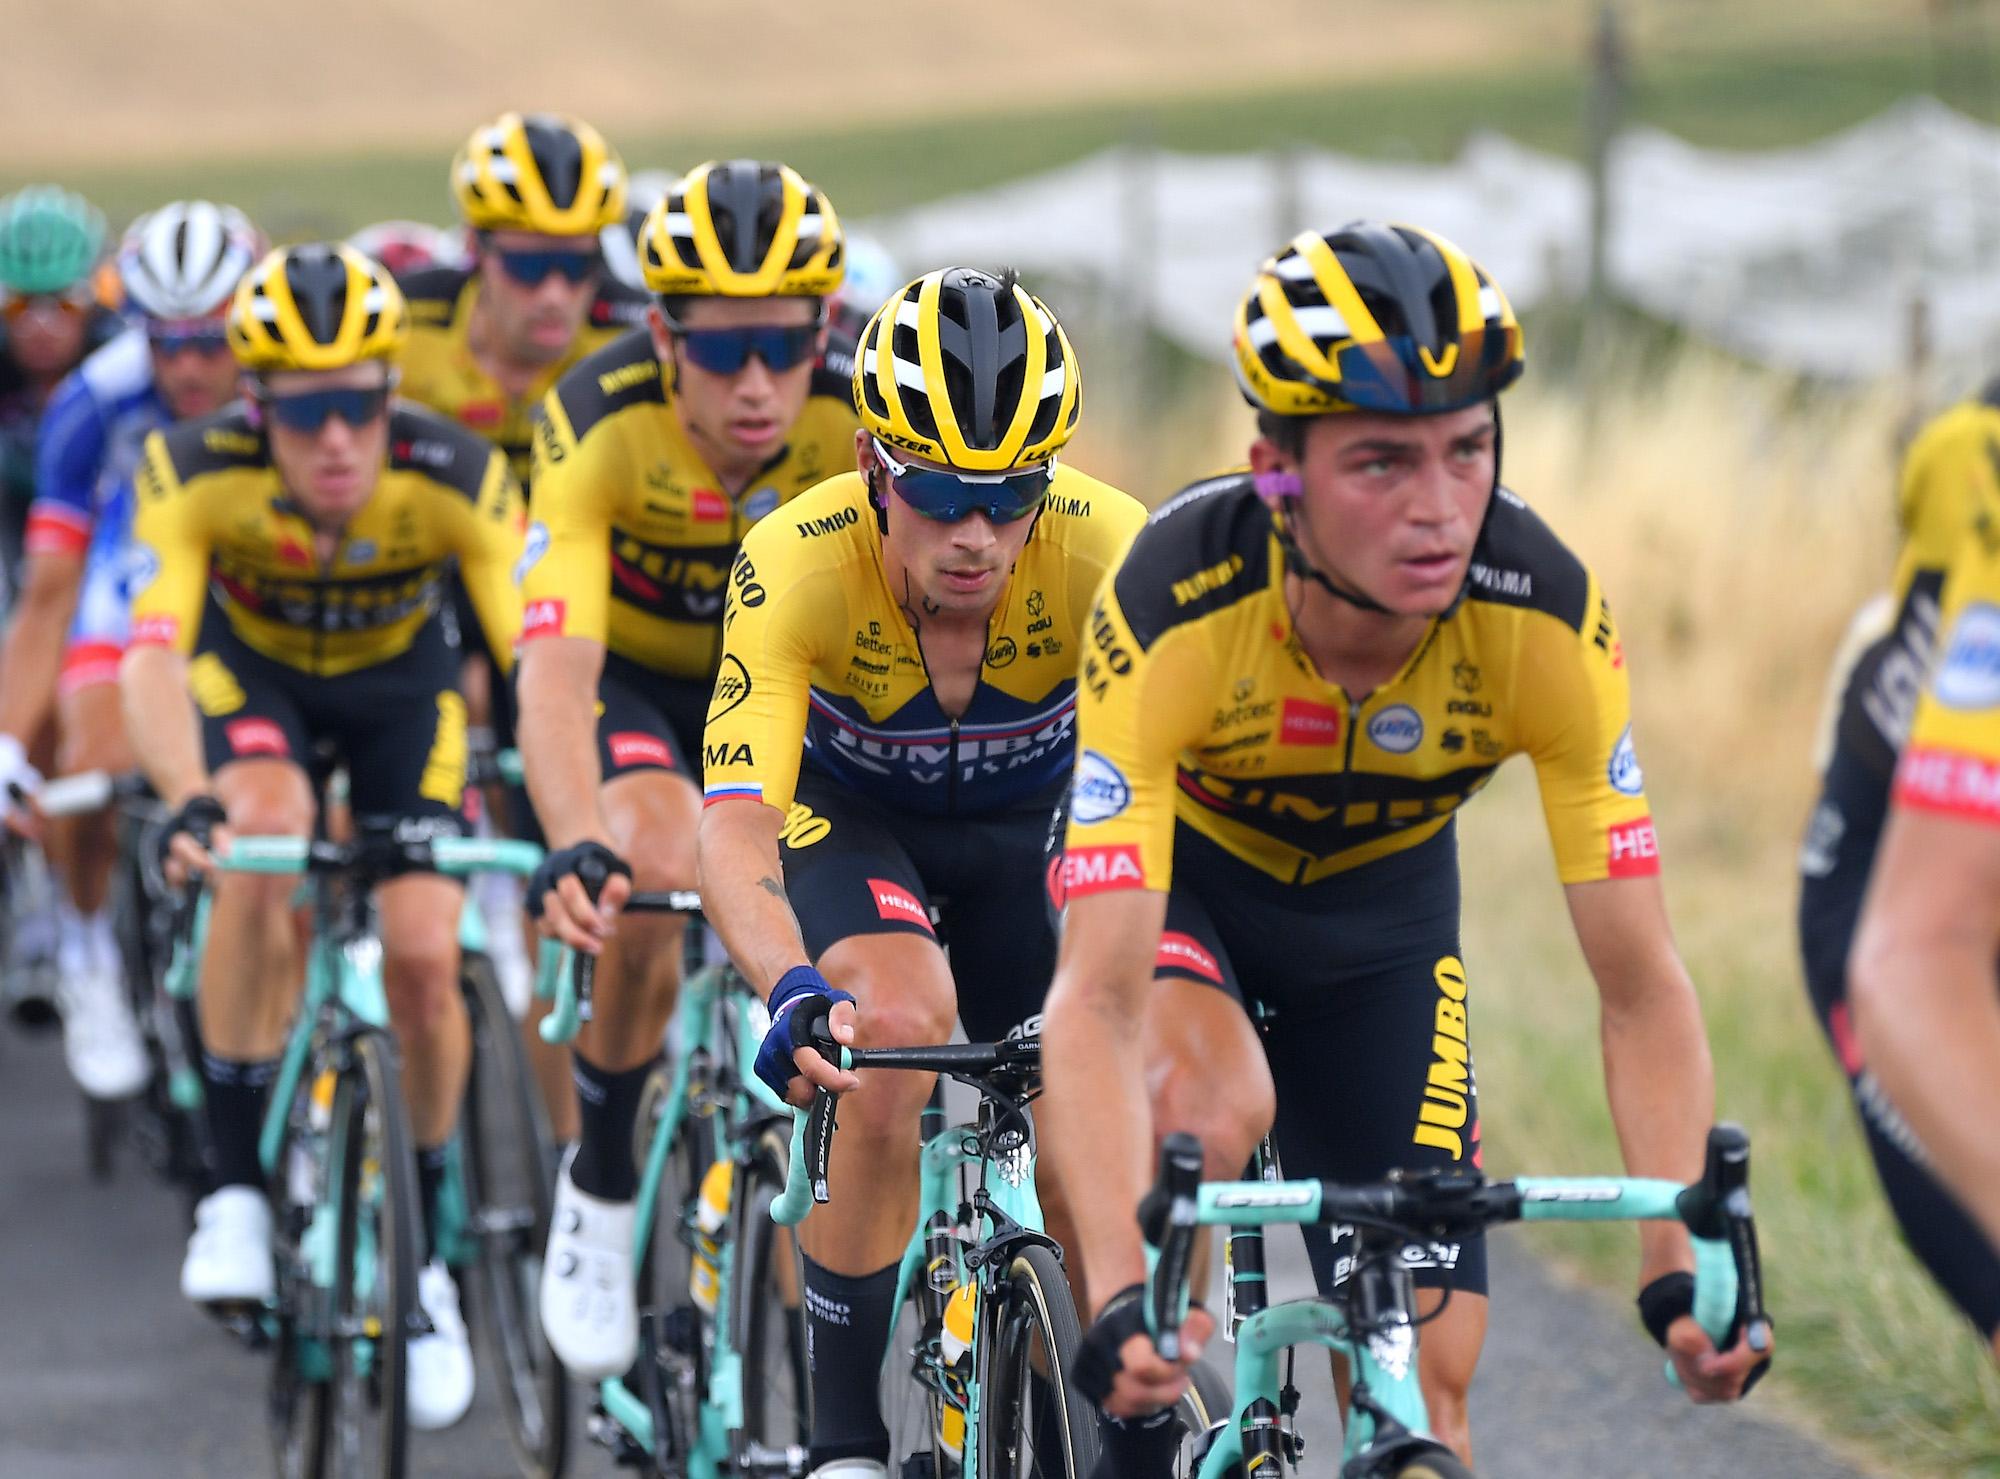 'I keep an eye on Egan Bernal,' says Primož Roglič as Jumbo-Visma find winning formula - Cycling Weekly